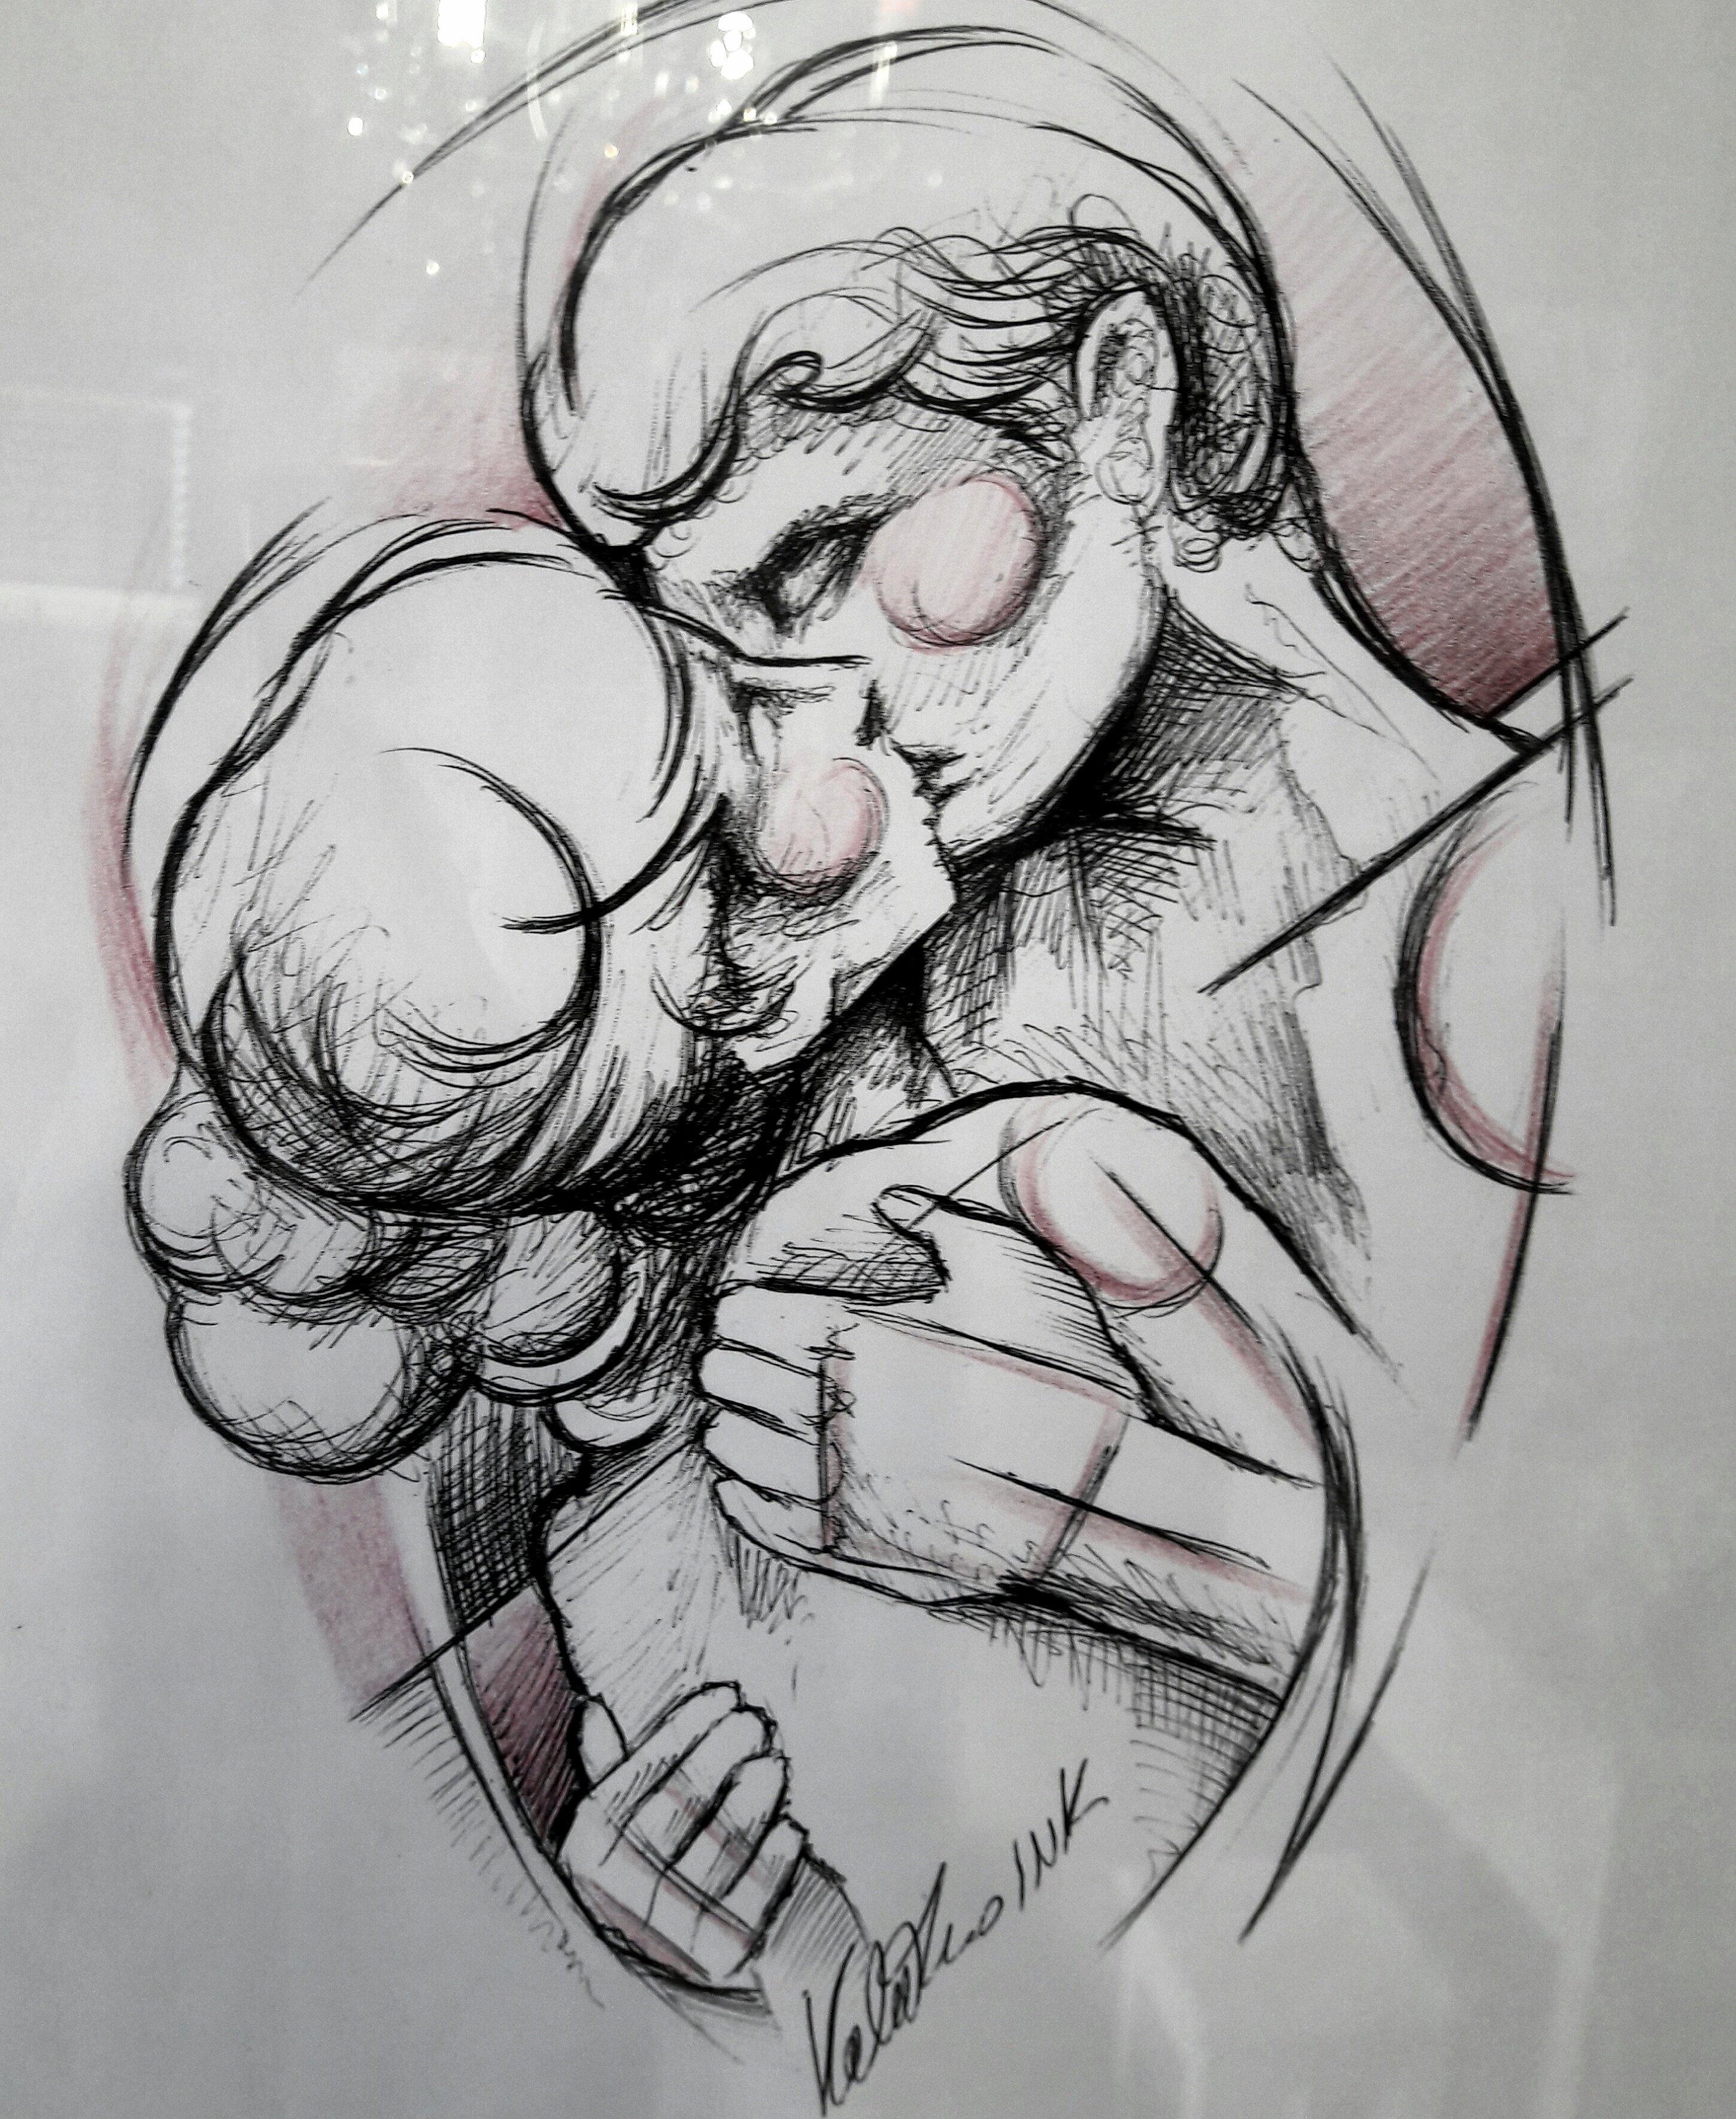 tatuaggi disegnati dal cliente